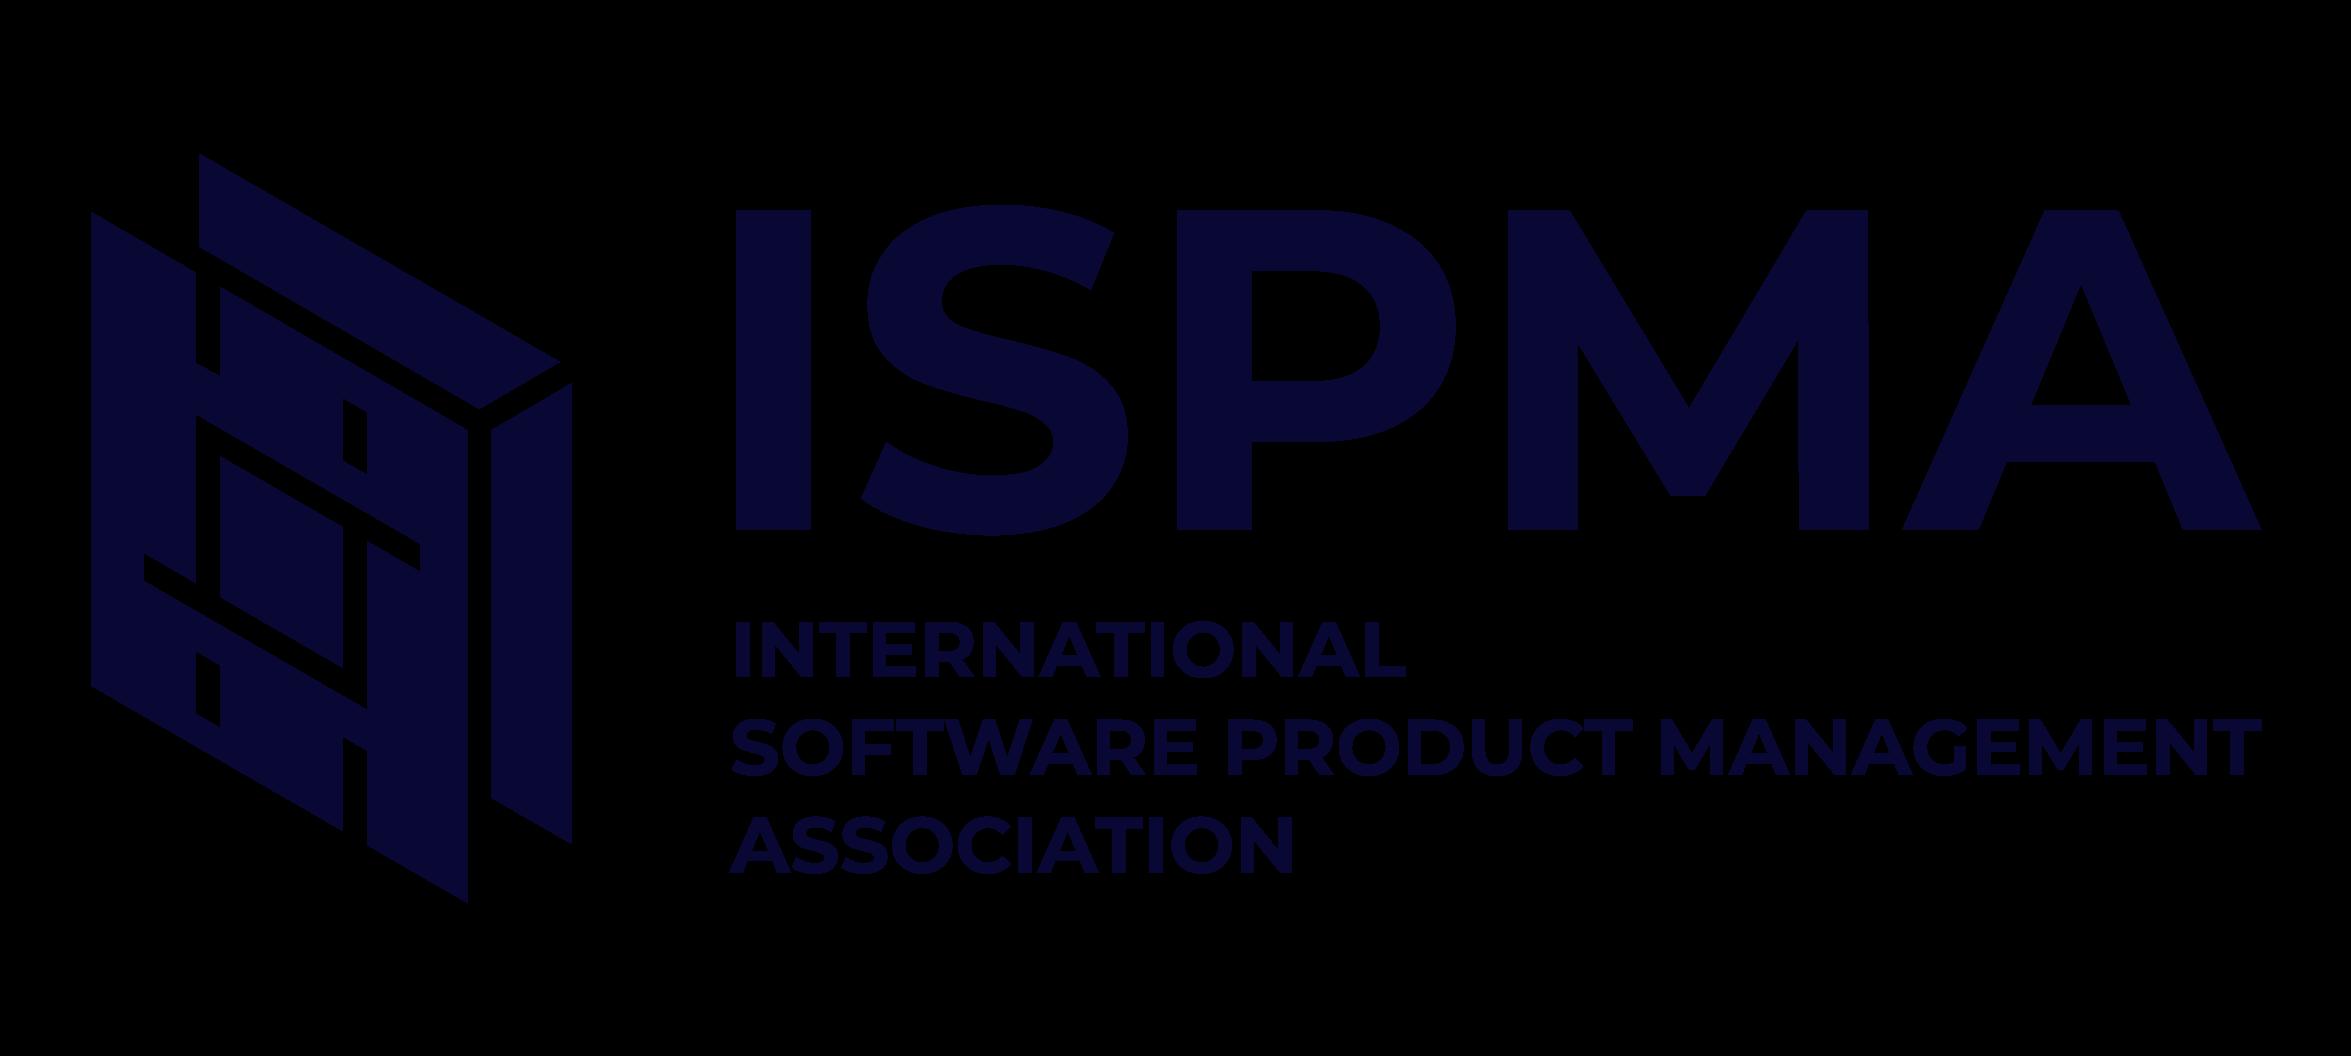 International Software Product Management Association